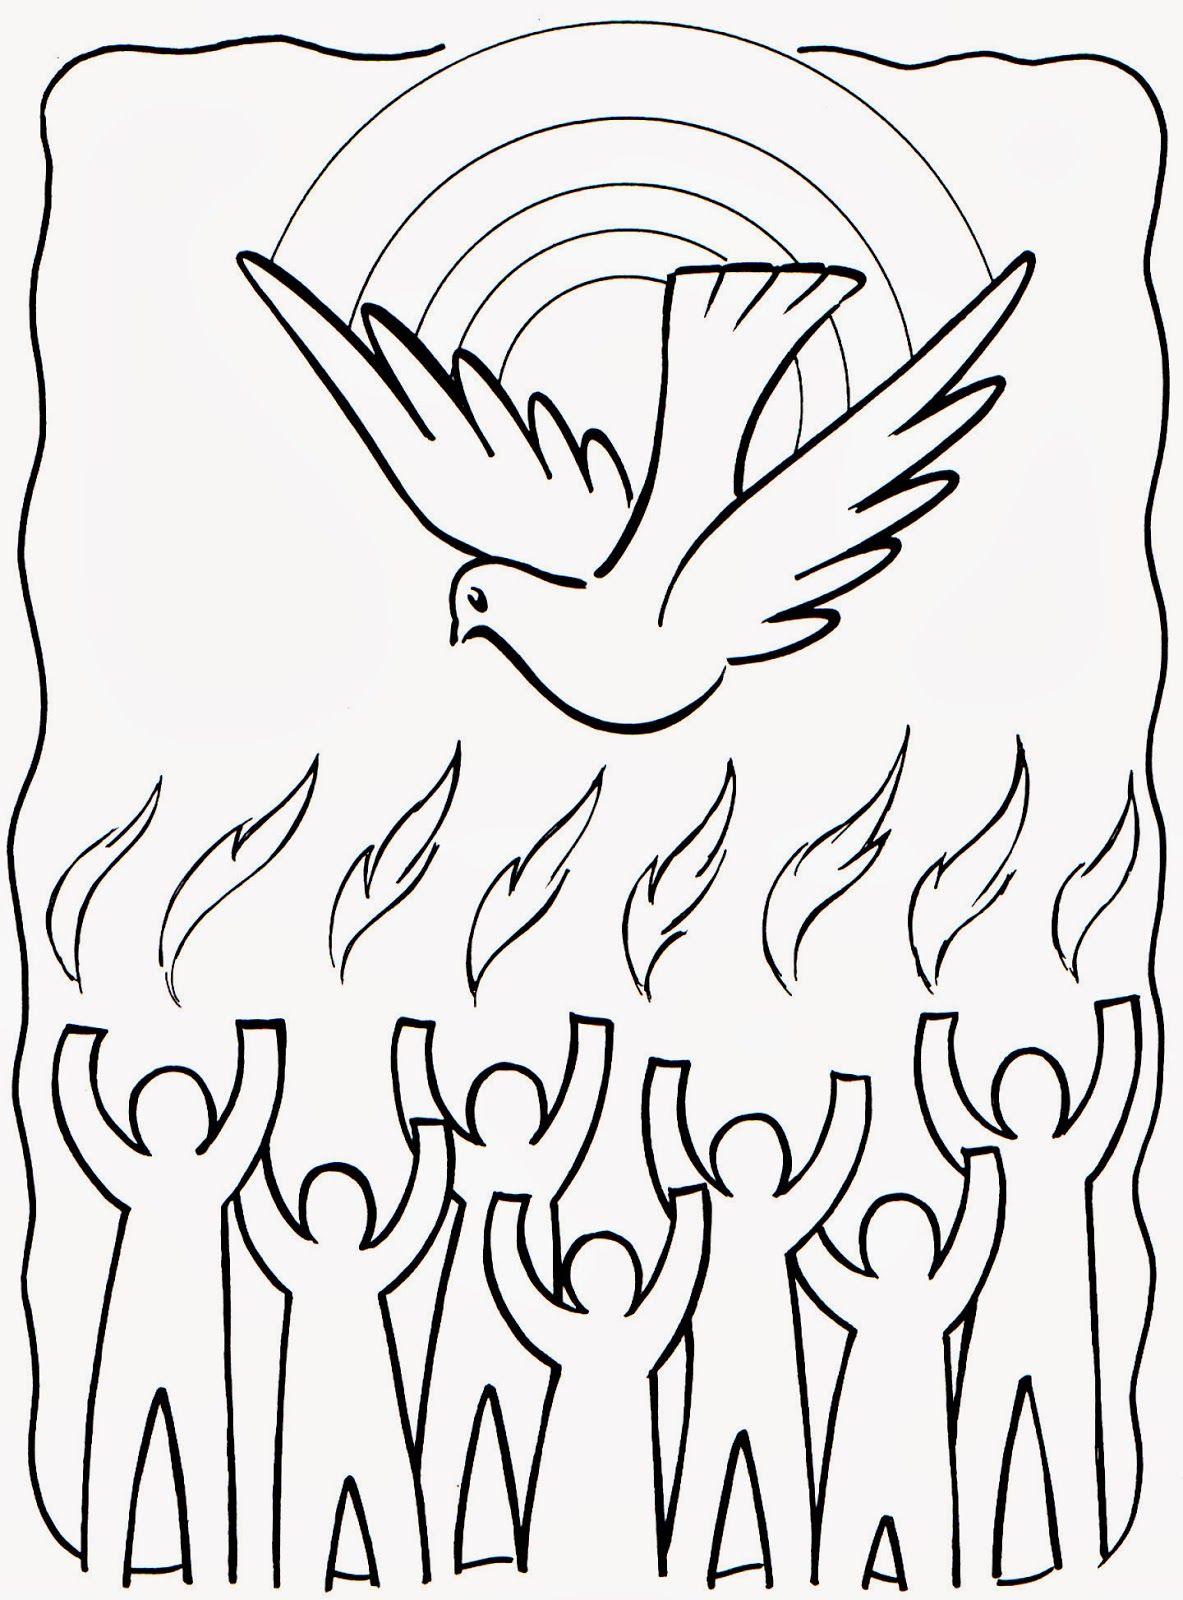 espiritu-santo-para-colorear.jpg (1183×1600) | Komunia Święta ...